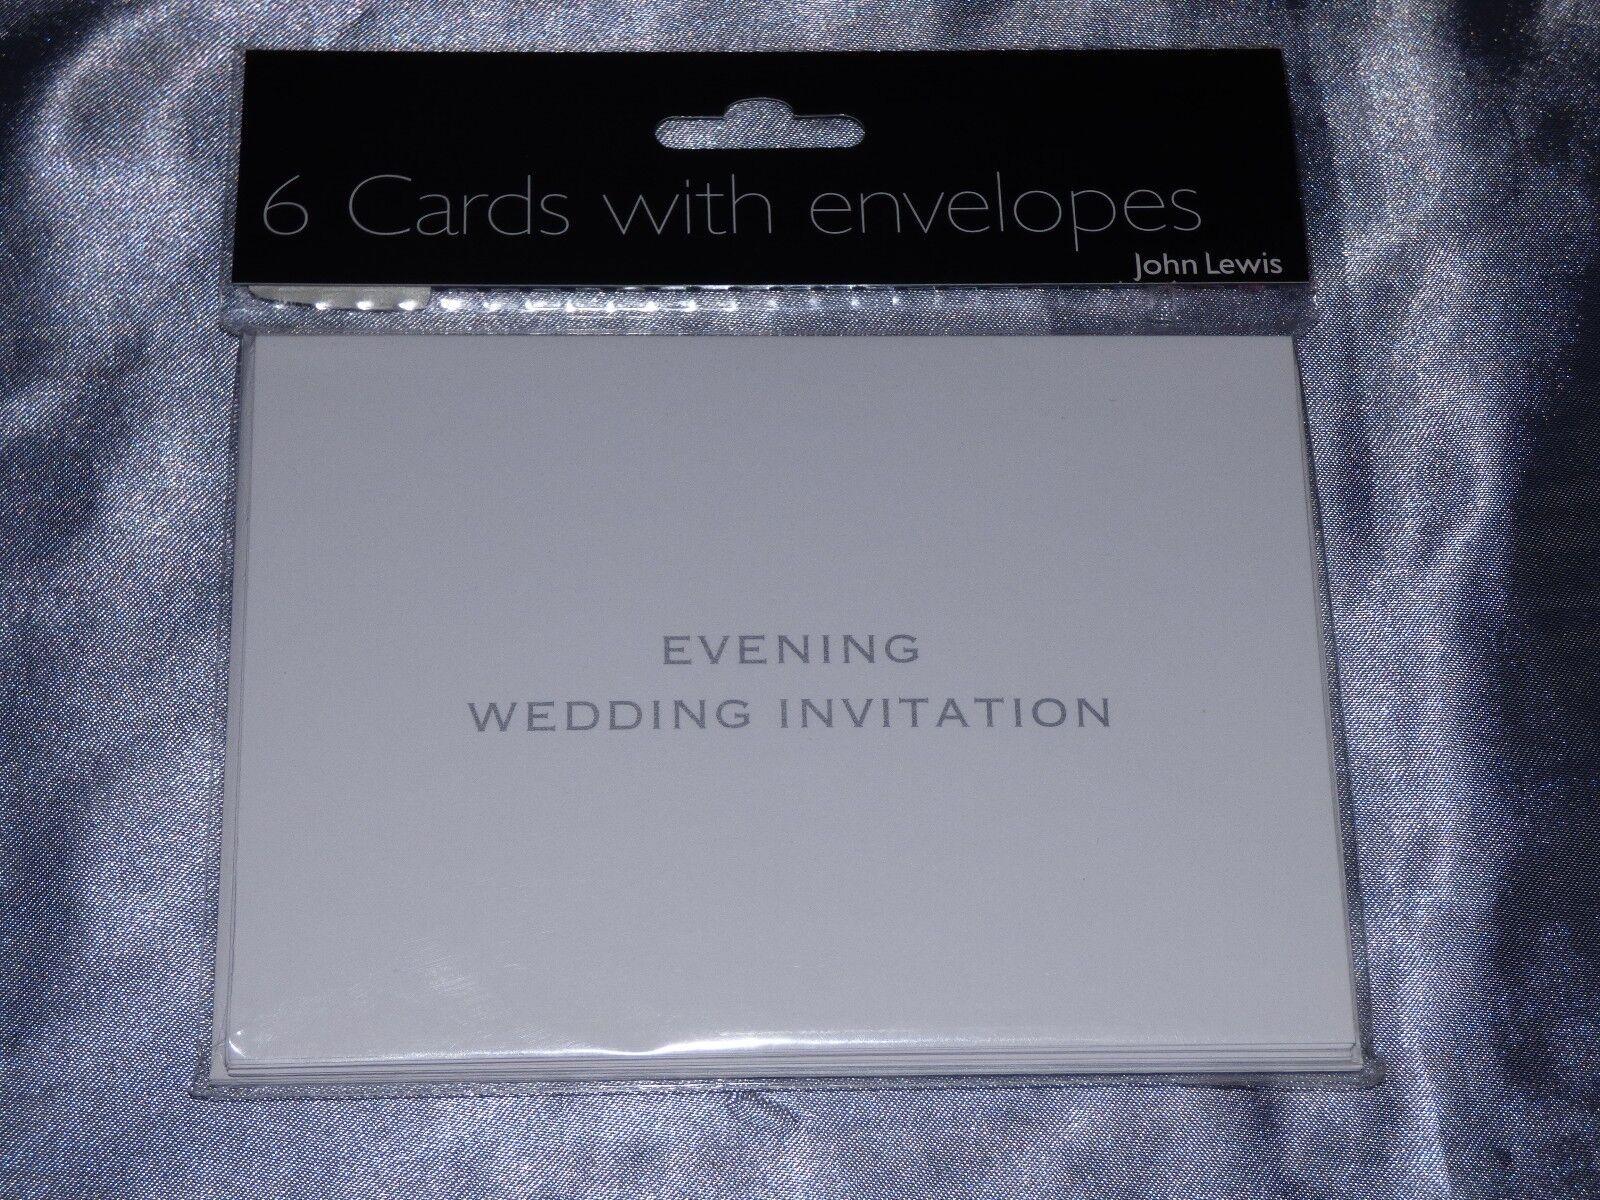 60th diamond wedding anniversary party invitation 6 card invitations resntentobalflowflowcomponenttechnicalissues stopboris Image collections